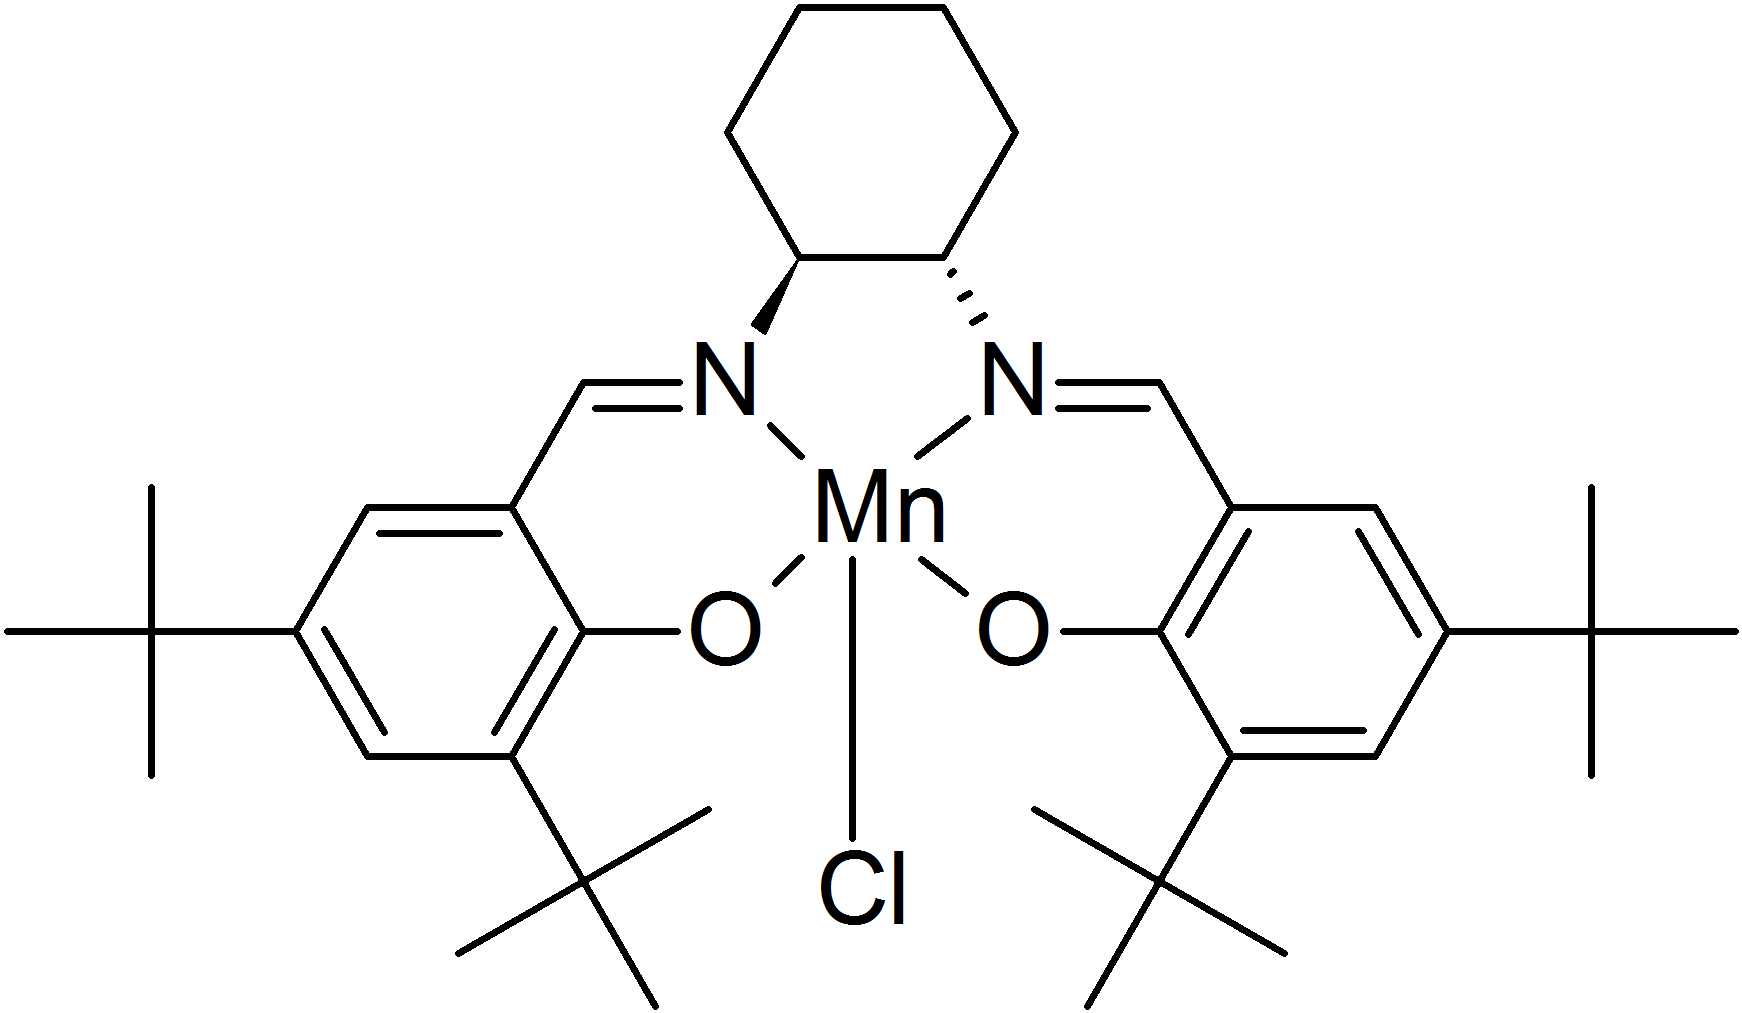 a report on the jacobsens catalyst Use jacobsen's catalyst in the asymmetric jacobsen's method of epoxidation of an alkene jacobsen's method of epoxidation of an alkene essay sample.